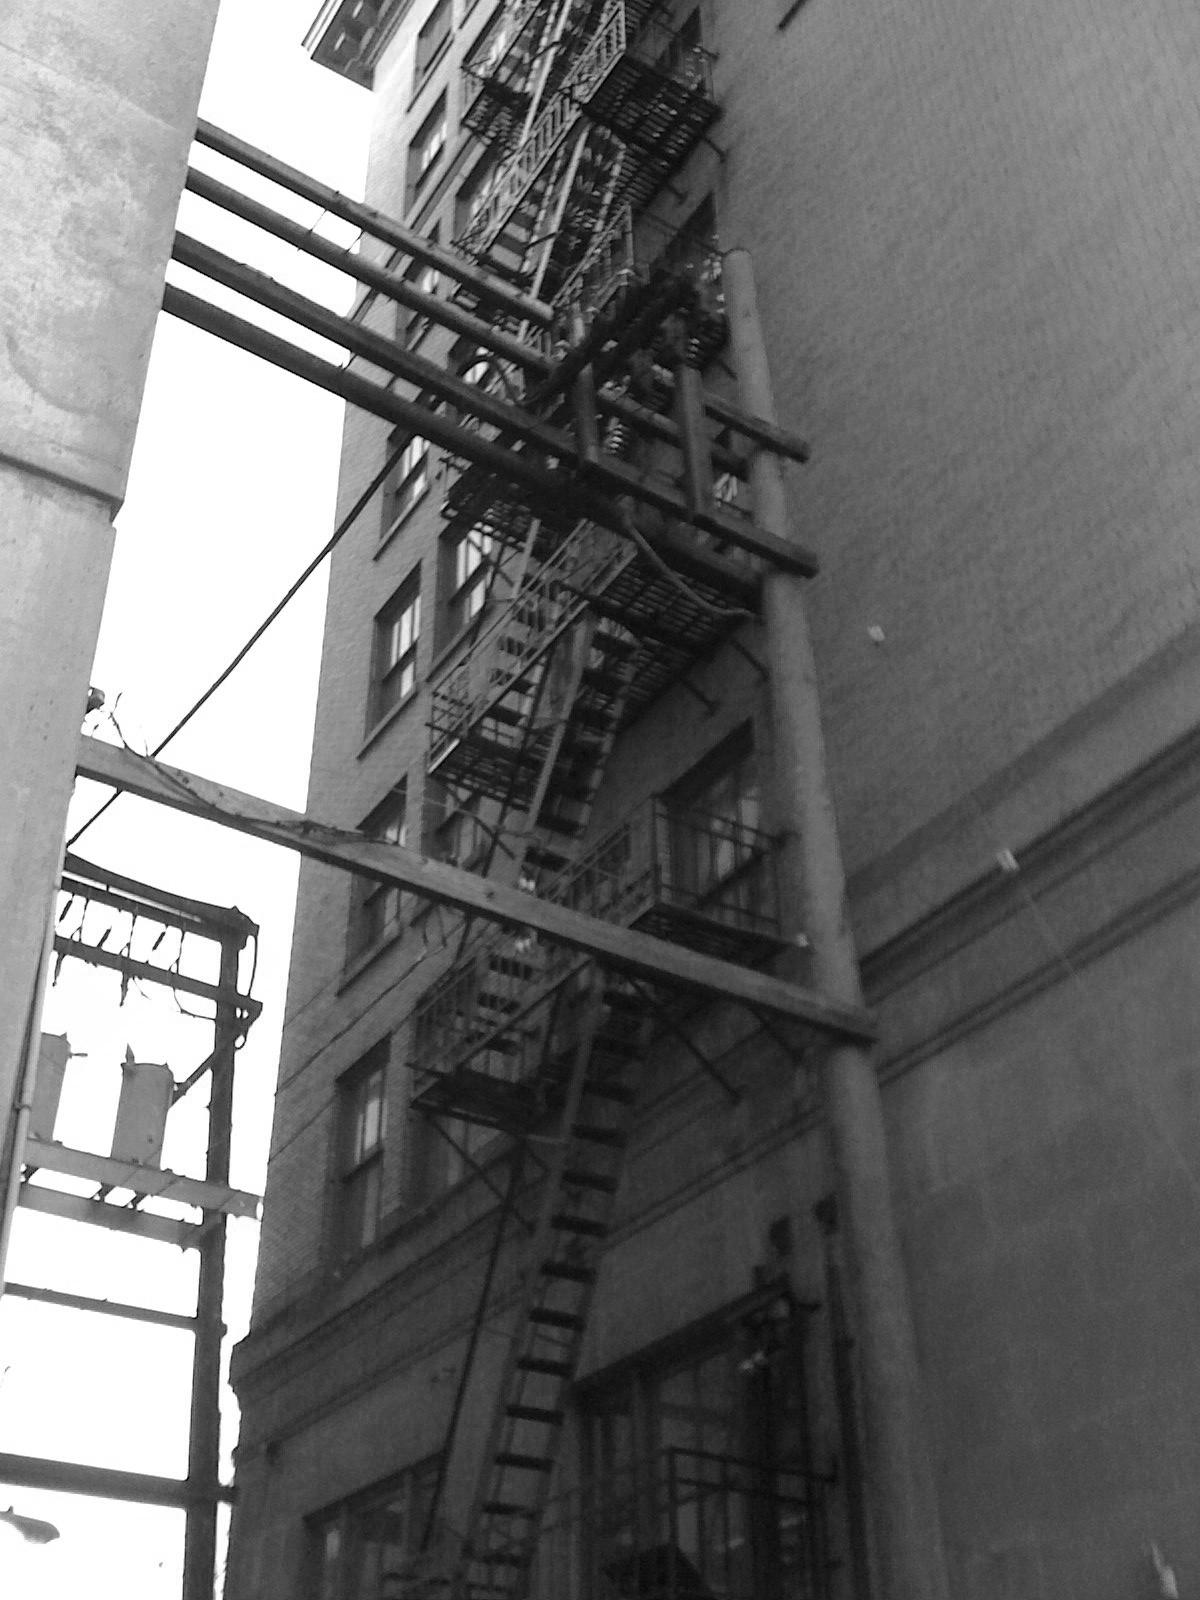 Vancouver alleyway – flight of stairs